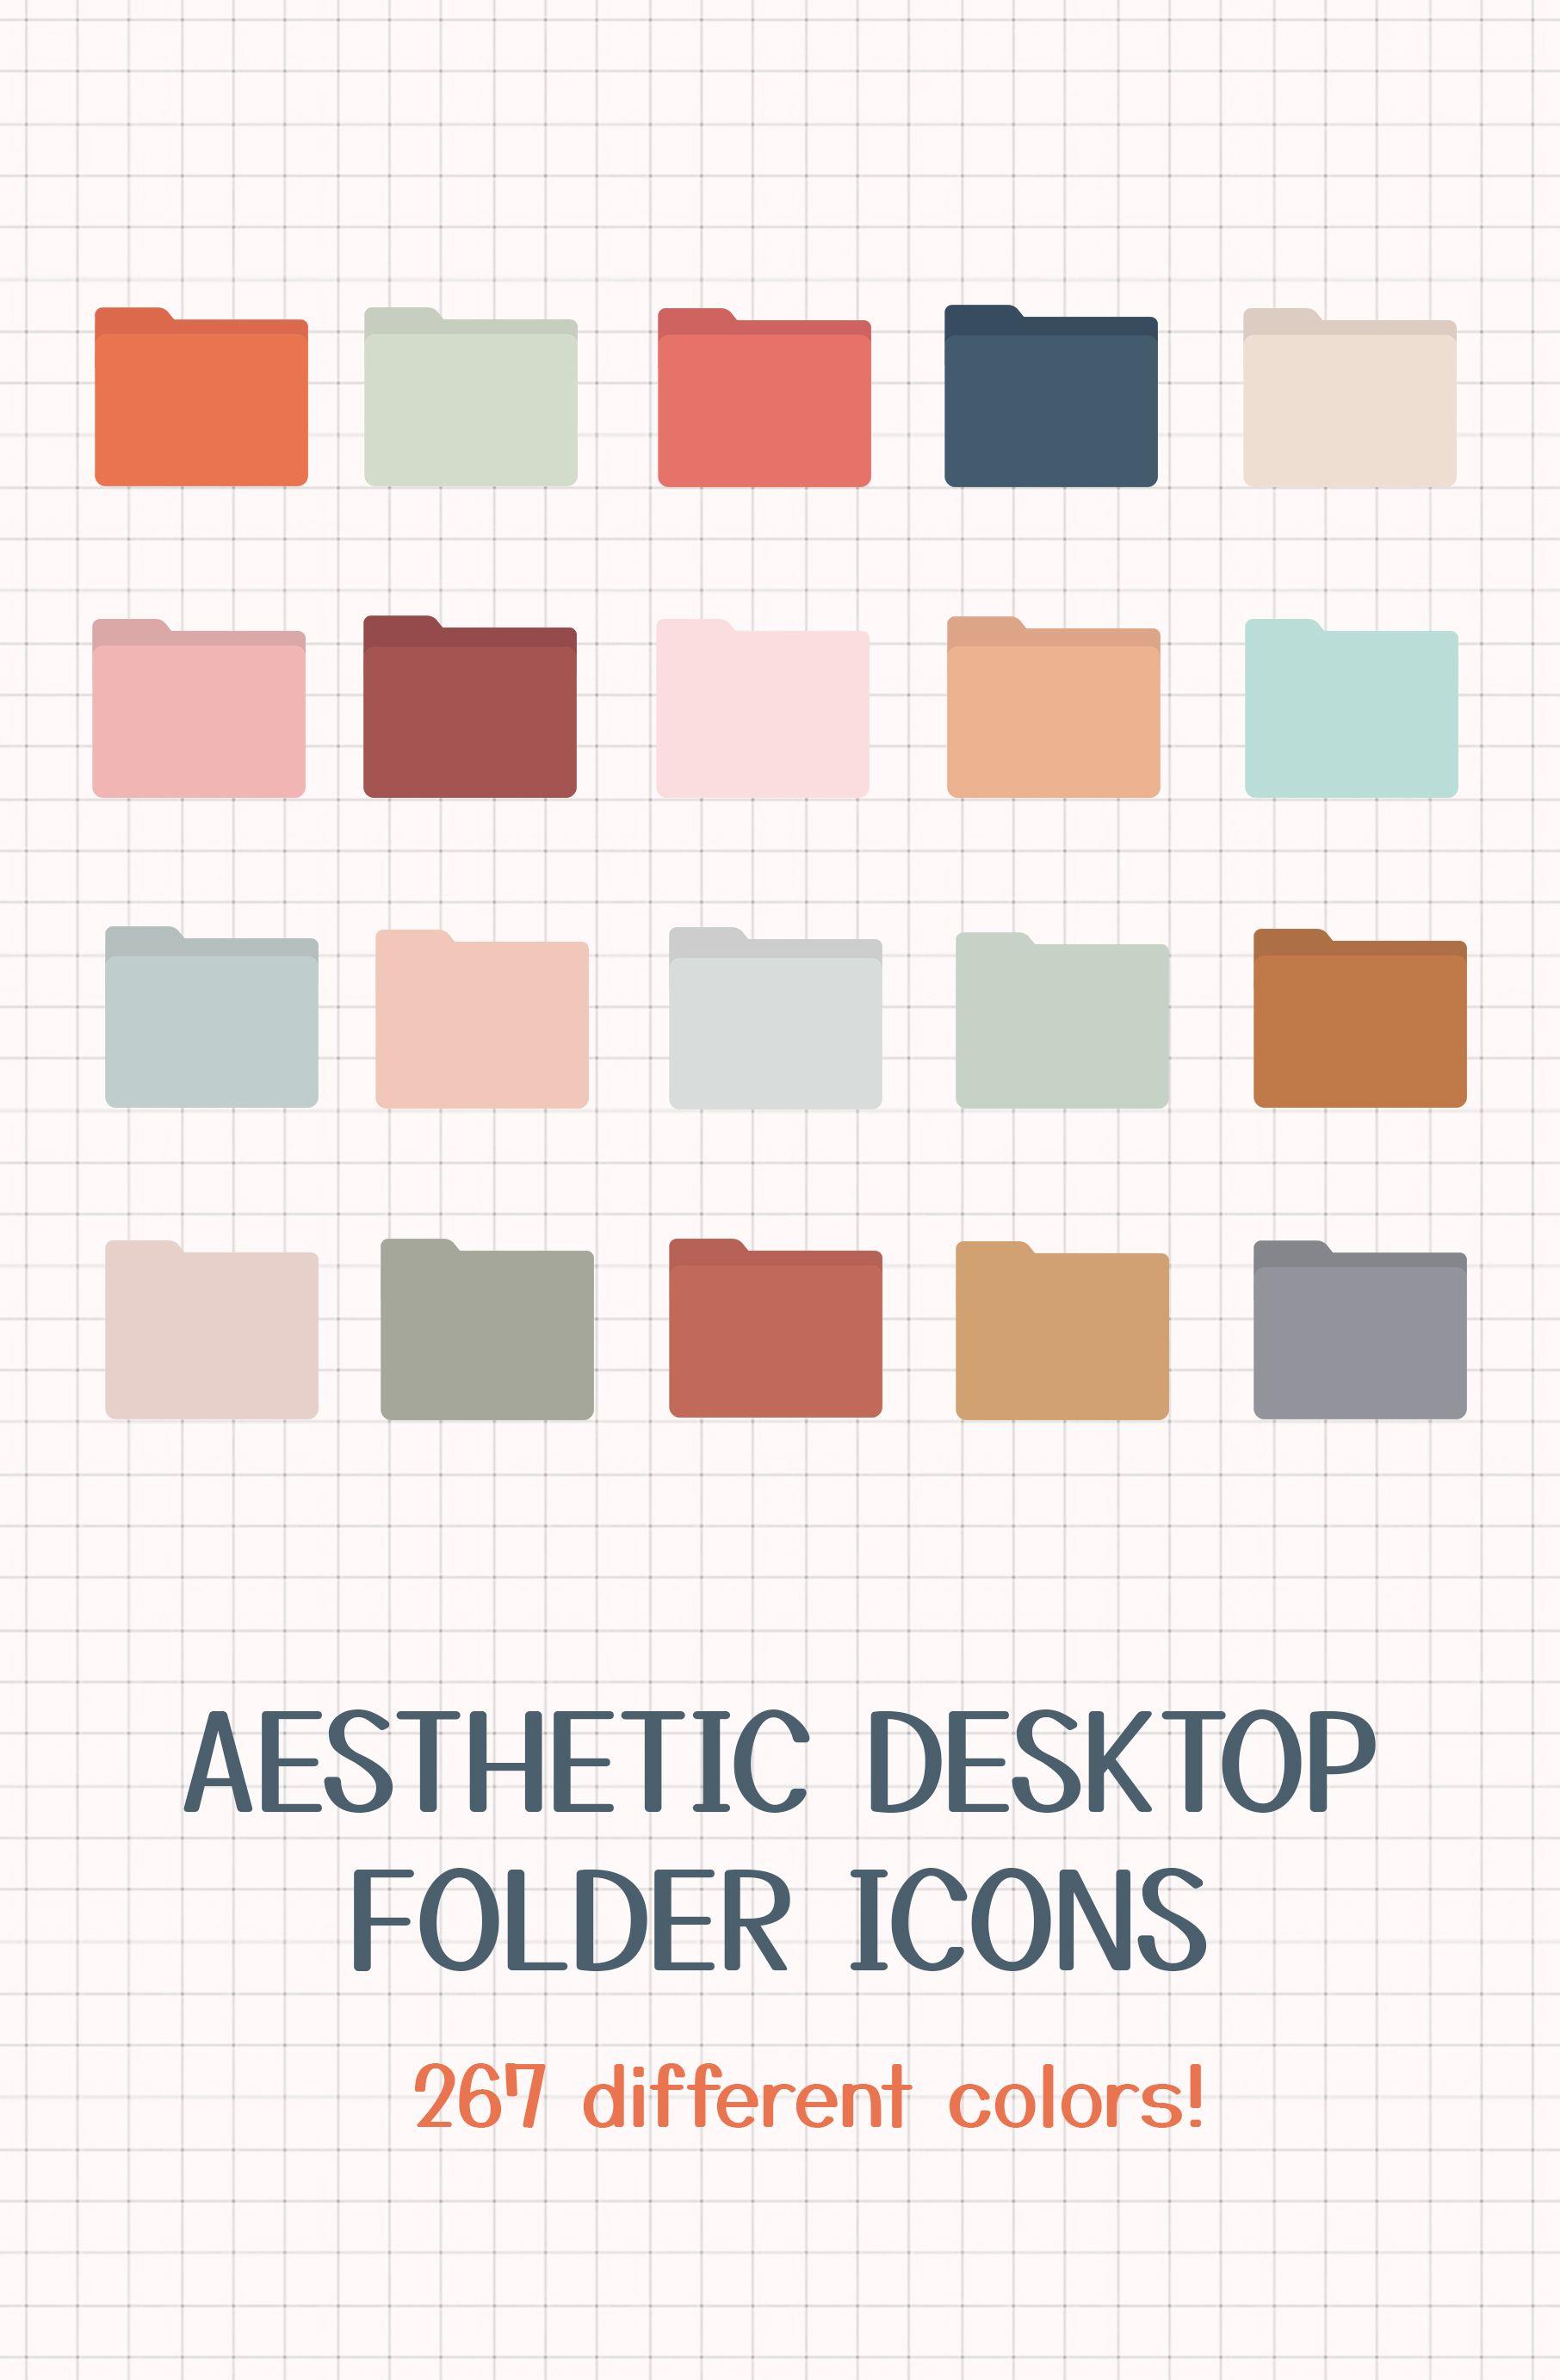 Boho Desktop Folder Icons For Mac Desktop Folder Icons Aesthetic Desktop Folder Icons Aesthetic Macos Desktop Instant Download Artofit